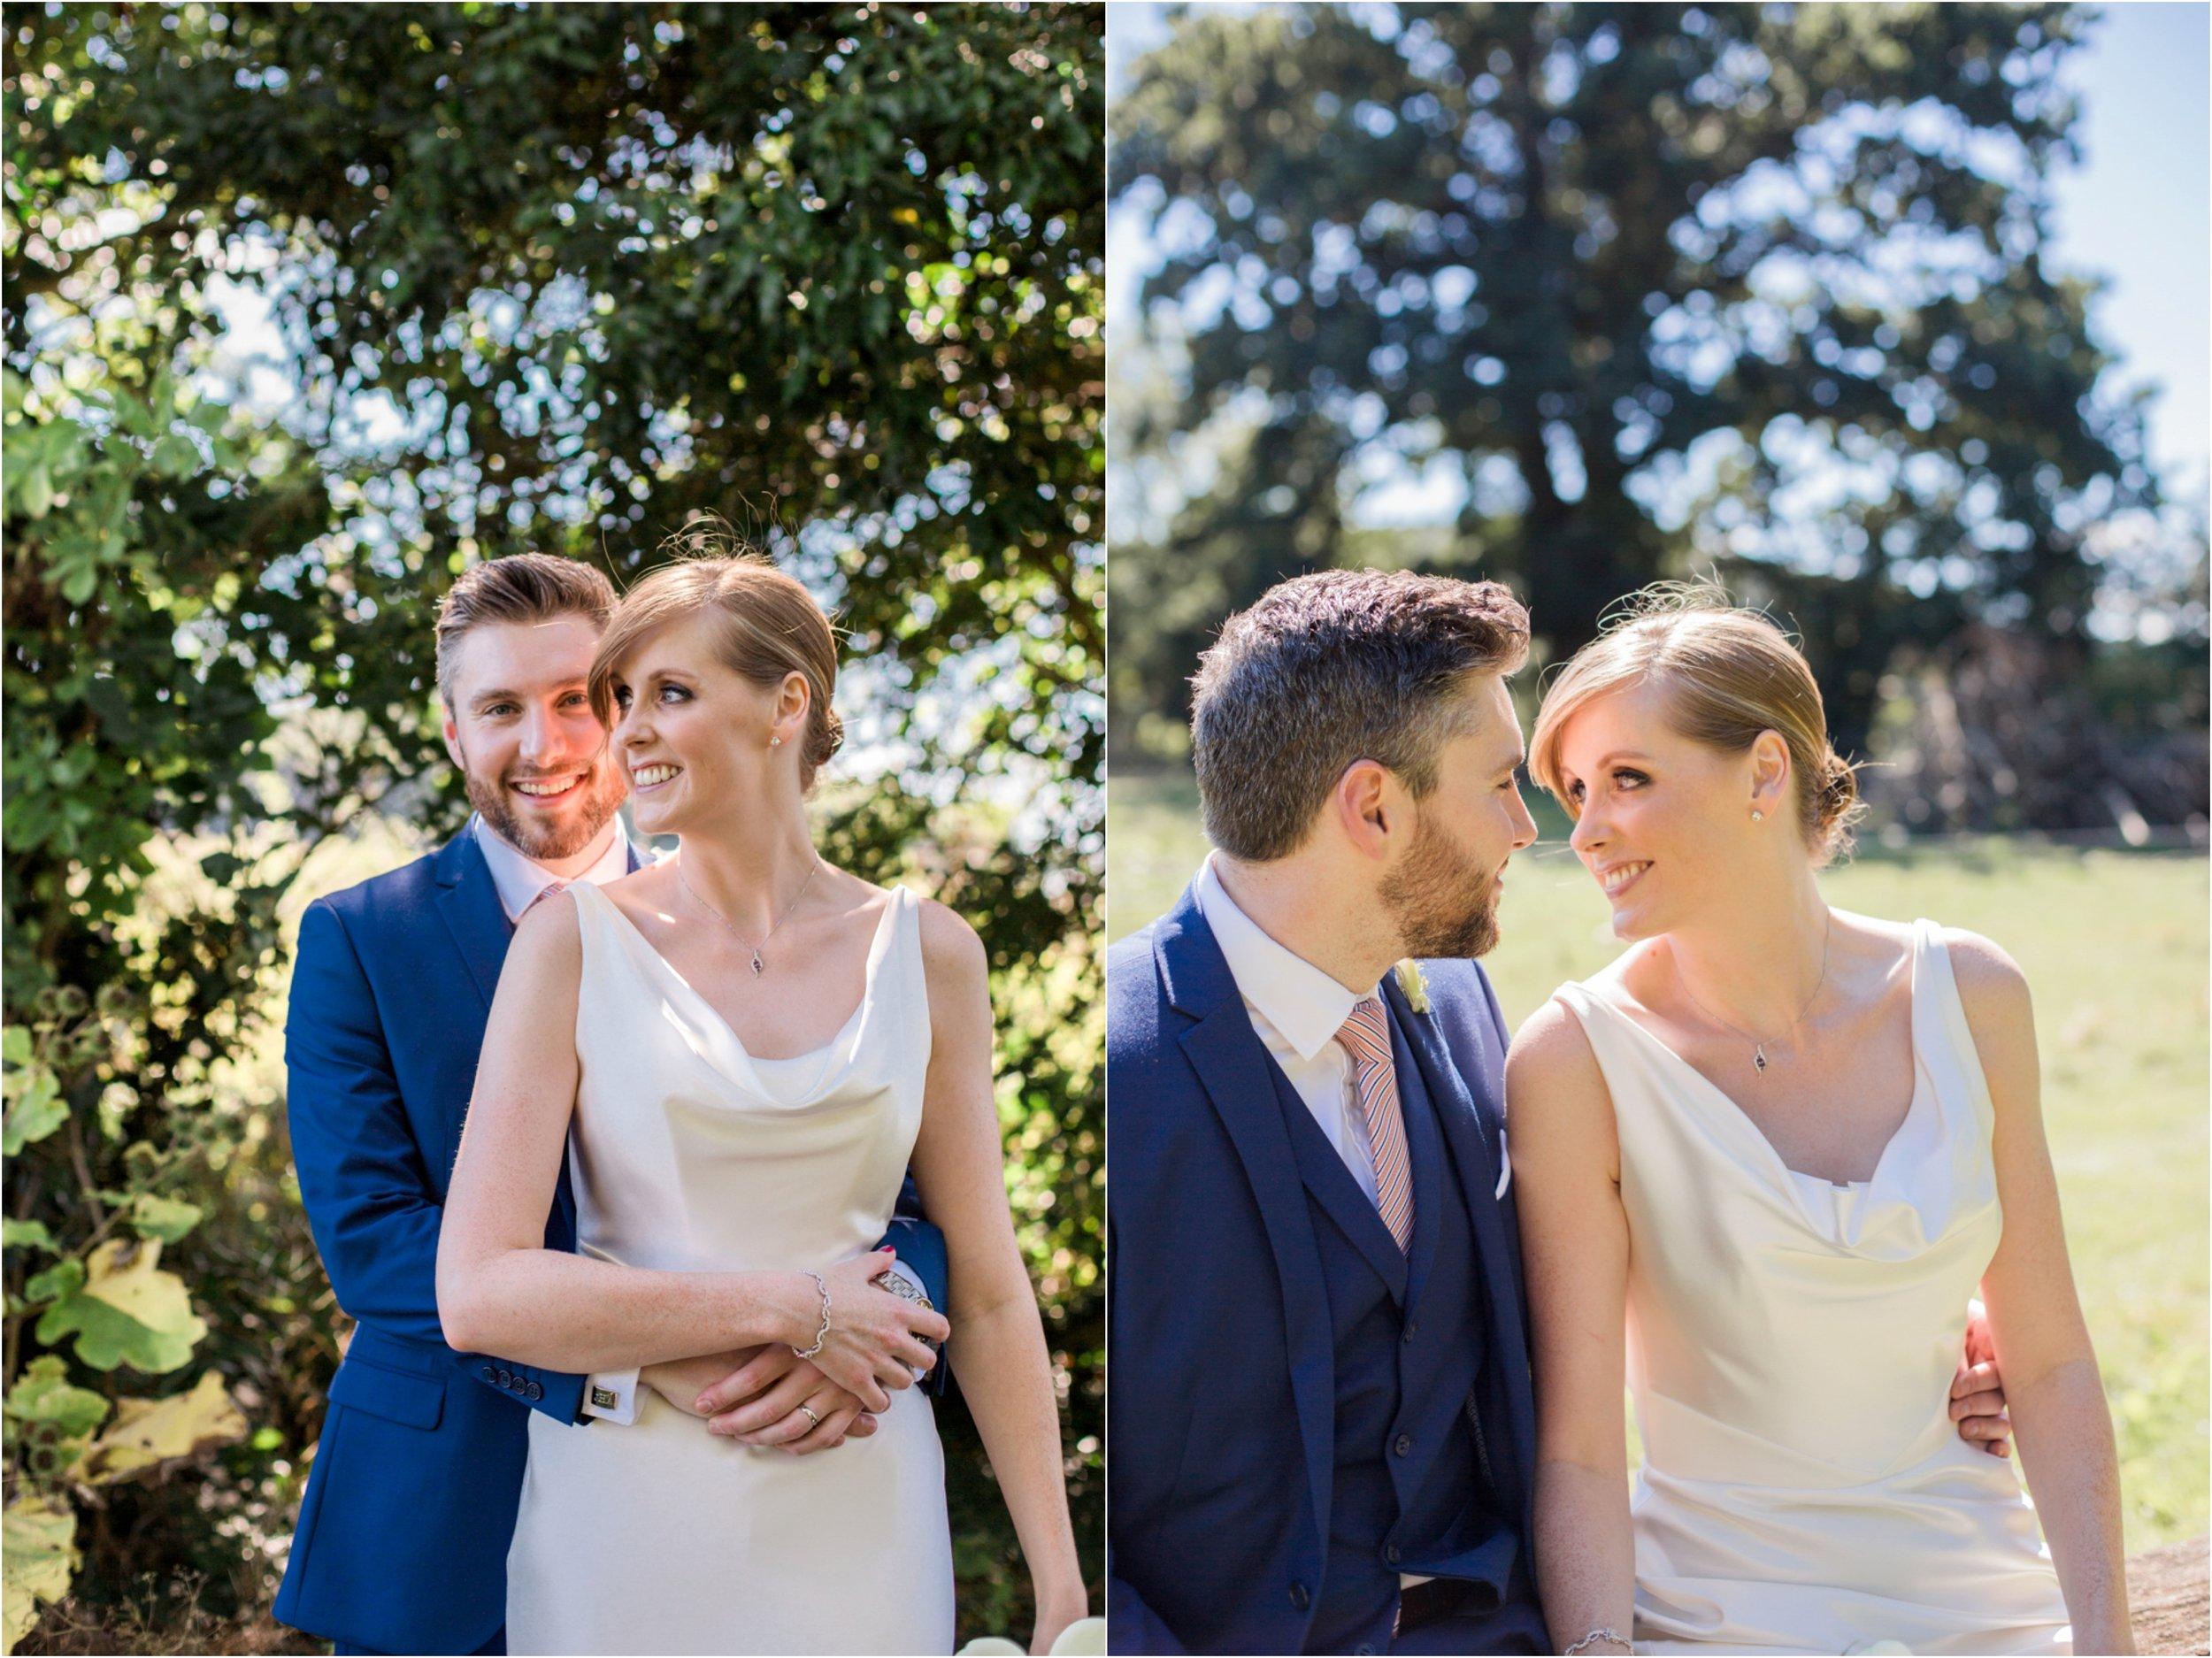 Sophie Evans Photography, Claire & John, Swallows Nest Barn Wedding, Warwickshire Wedding Photographer-81.jpg